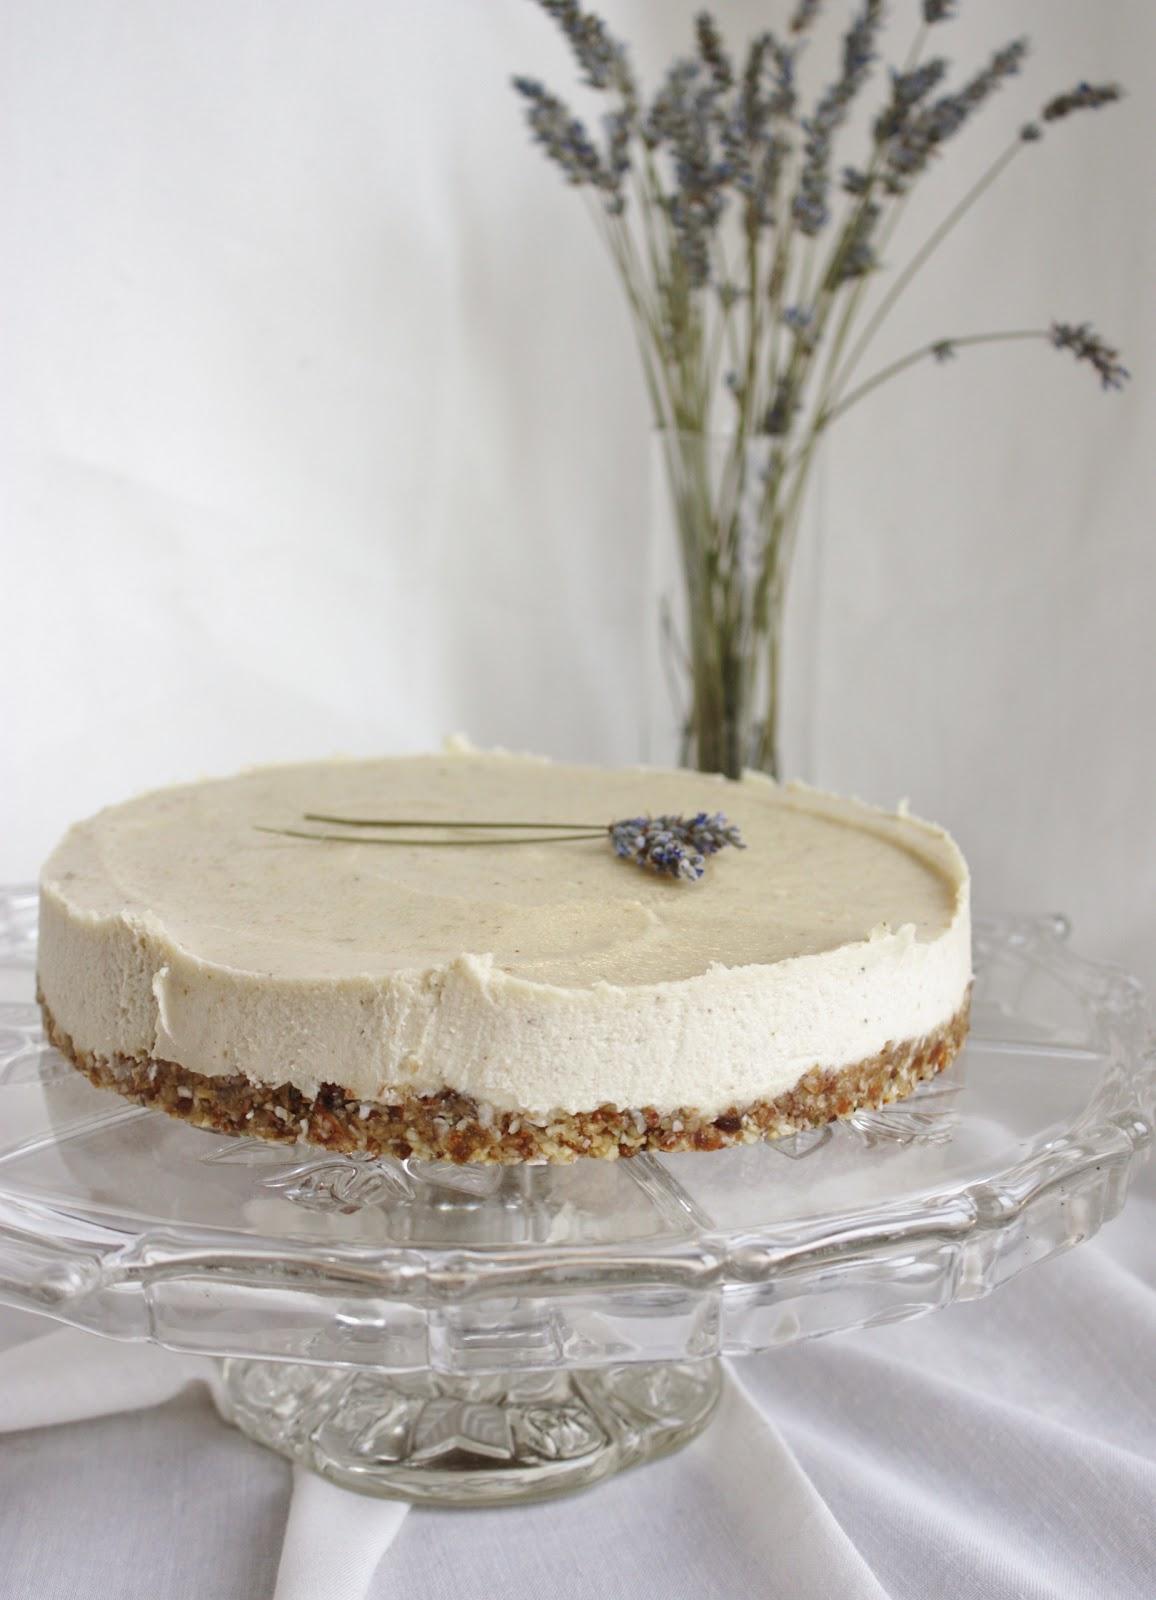 Honey Lavender Cheesecake Bars Recipes — Dishmaps